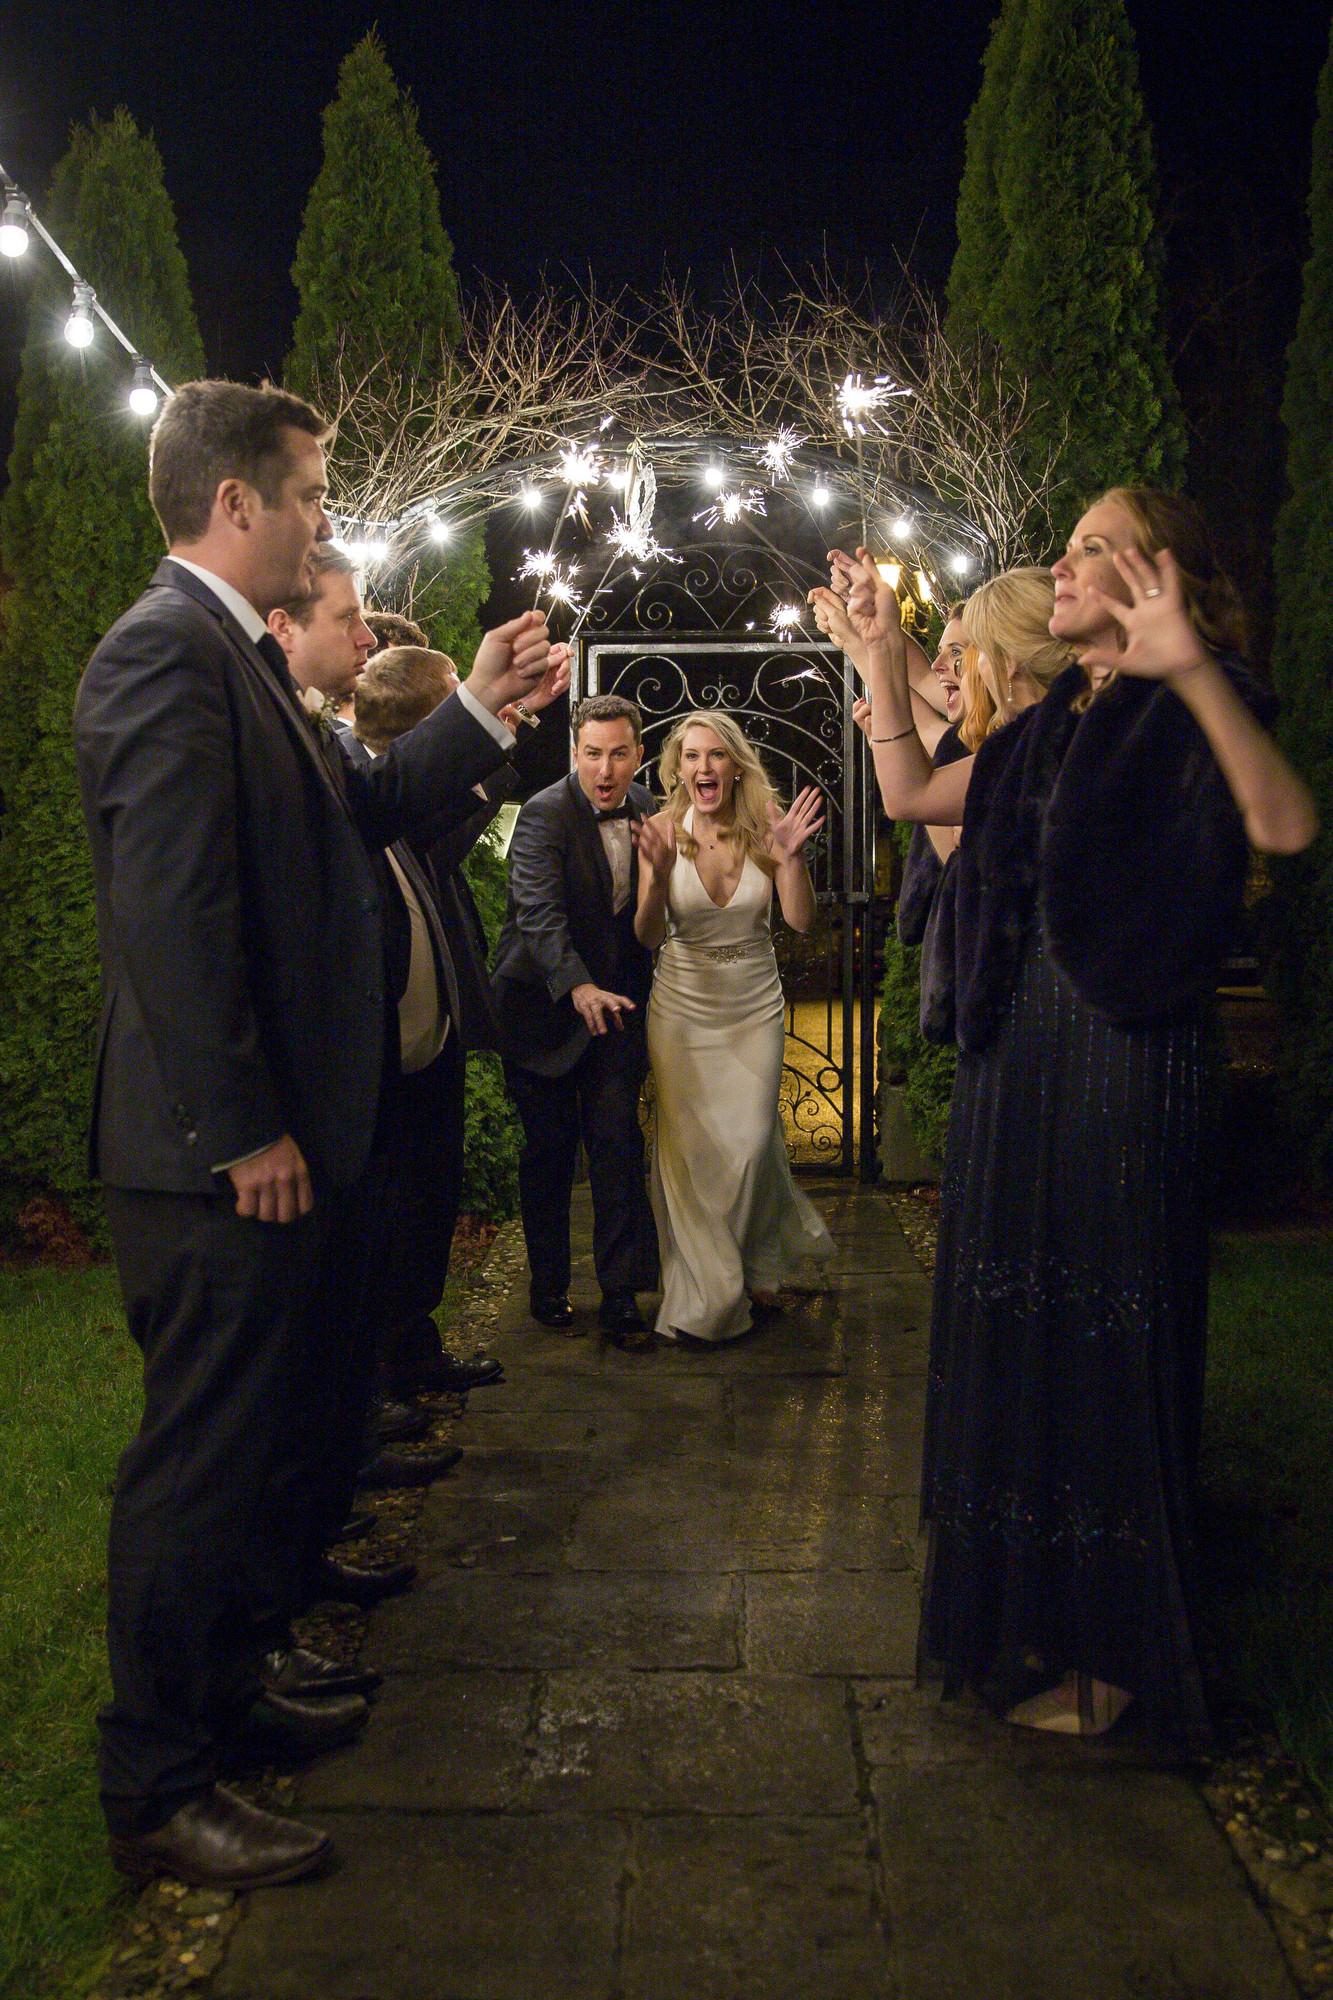 muckross_park_hotel_grougane_barra_wedding_photographer_goldenmoments_080.jpg